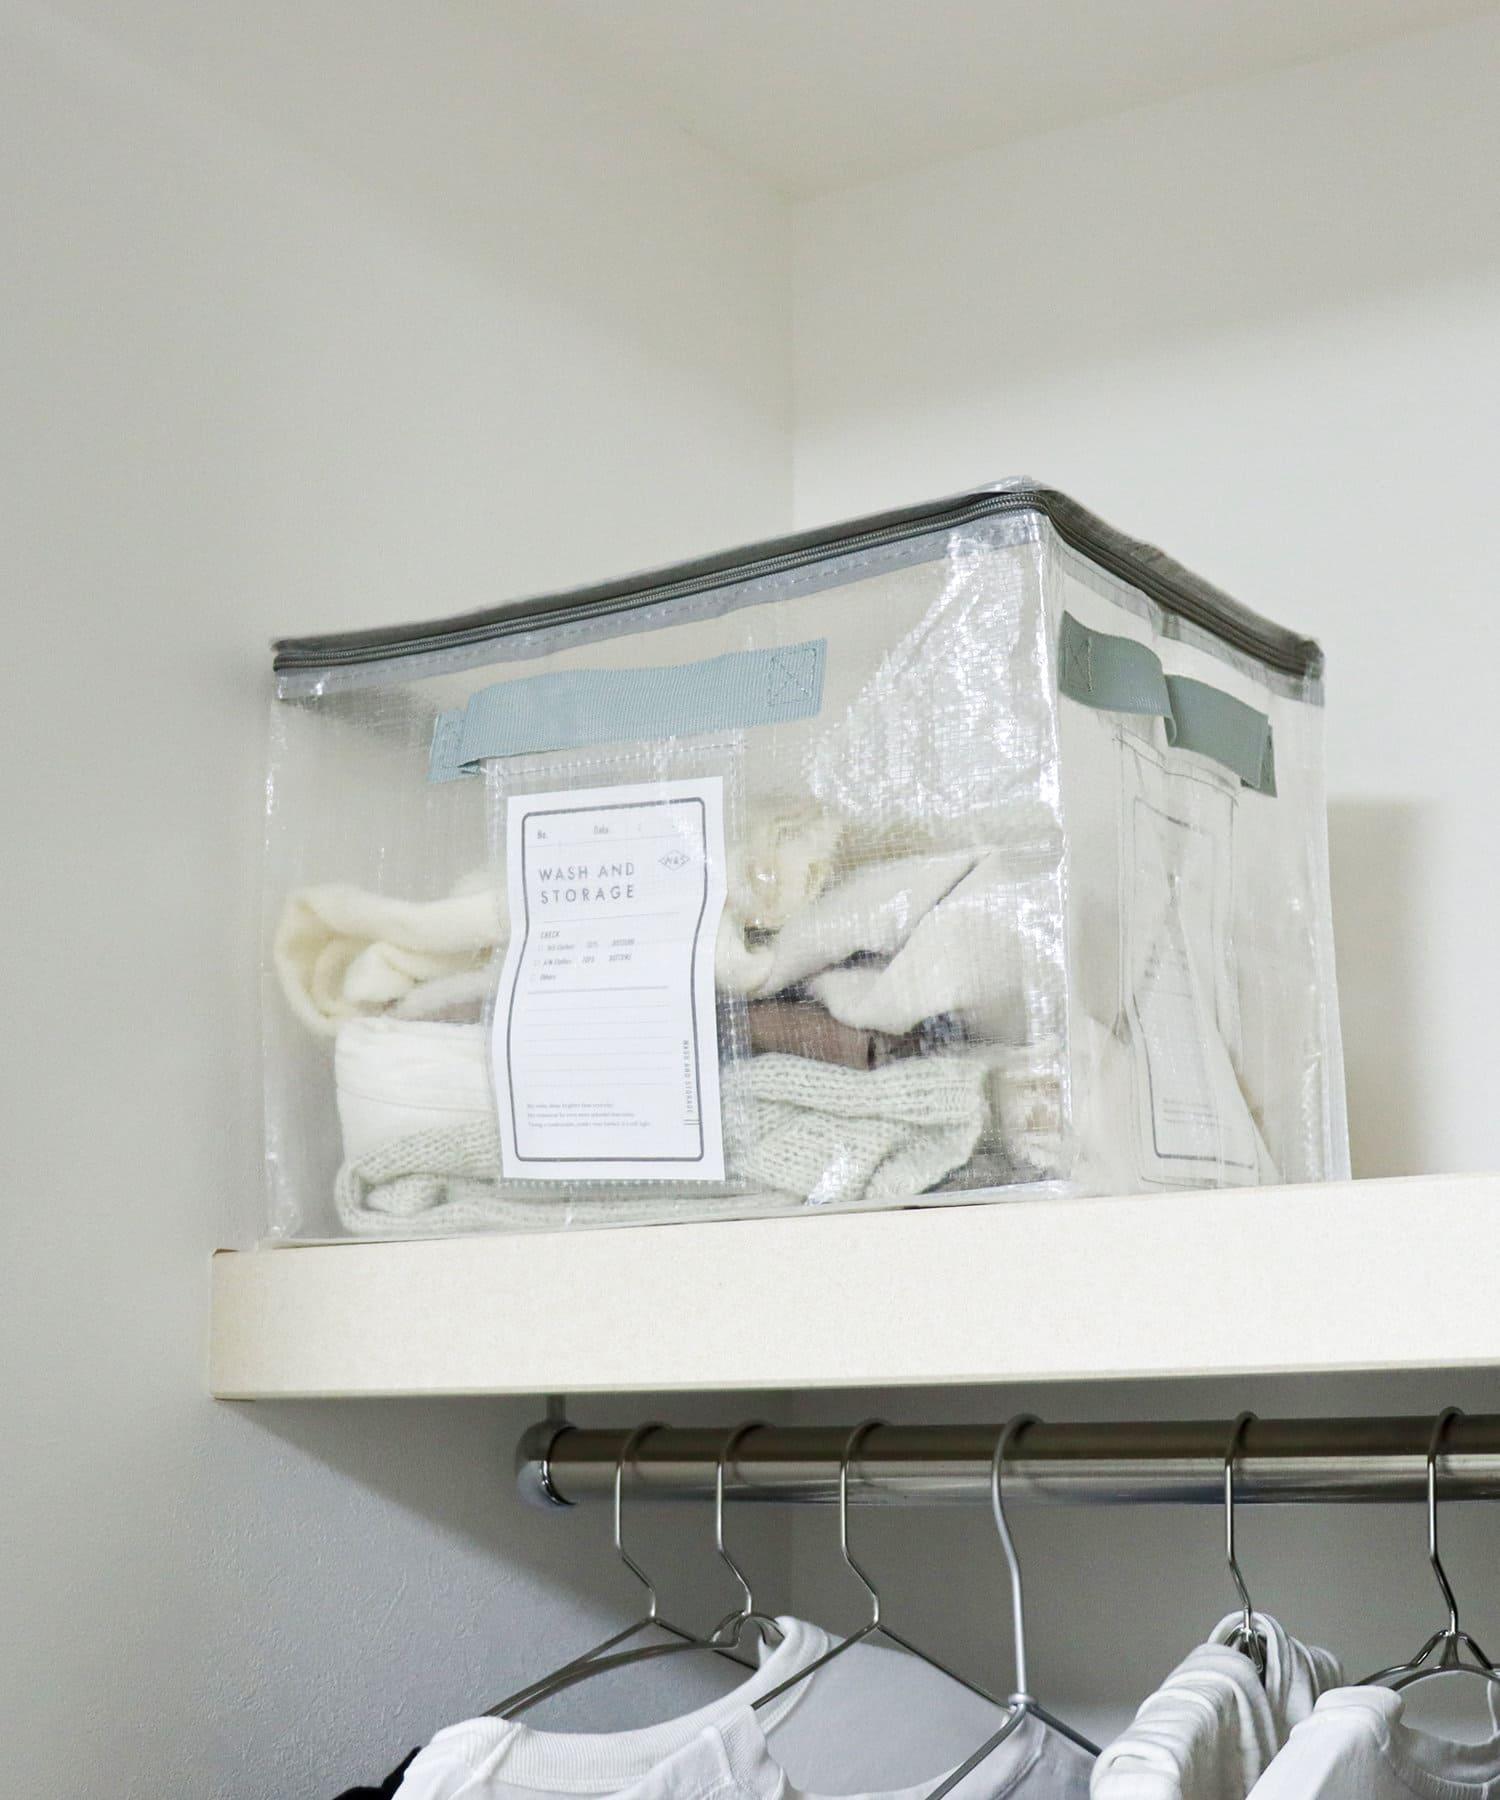 3COINS(スリーコインズ) フタ付きクリアワイドボックス